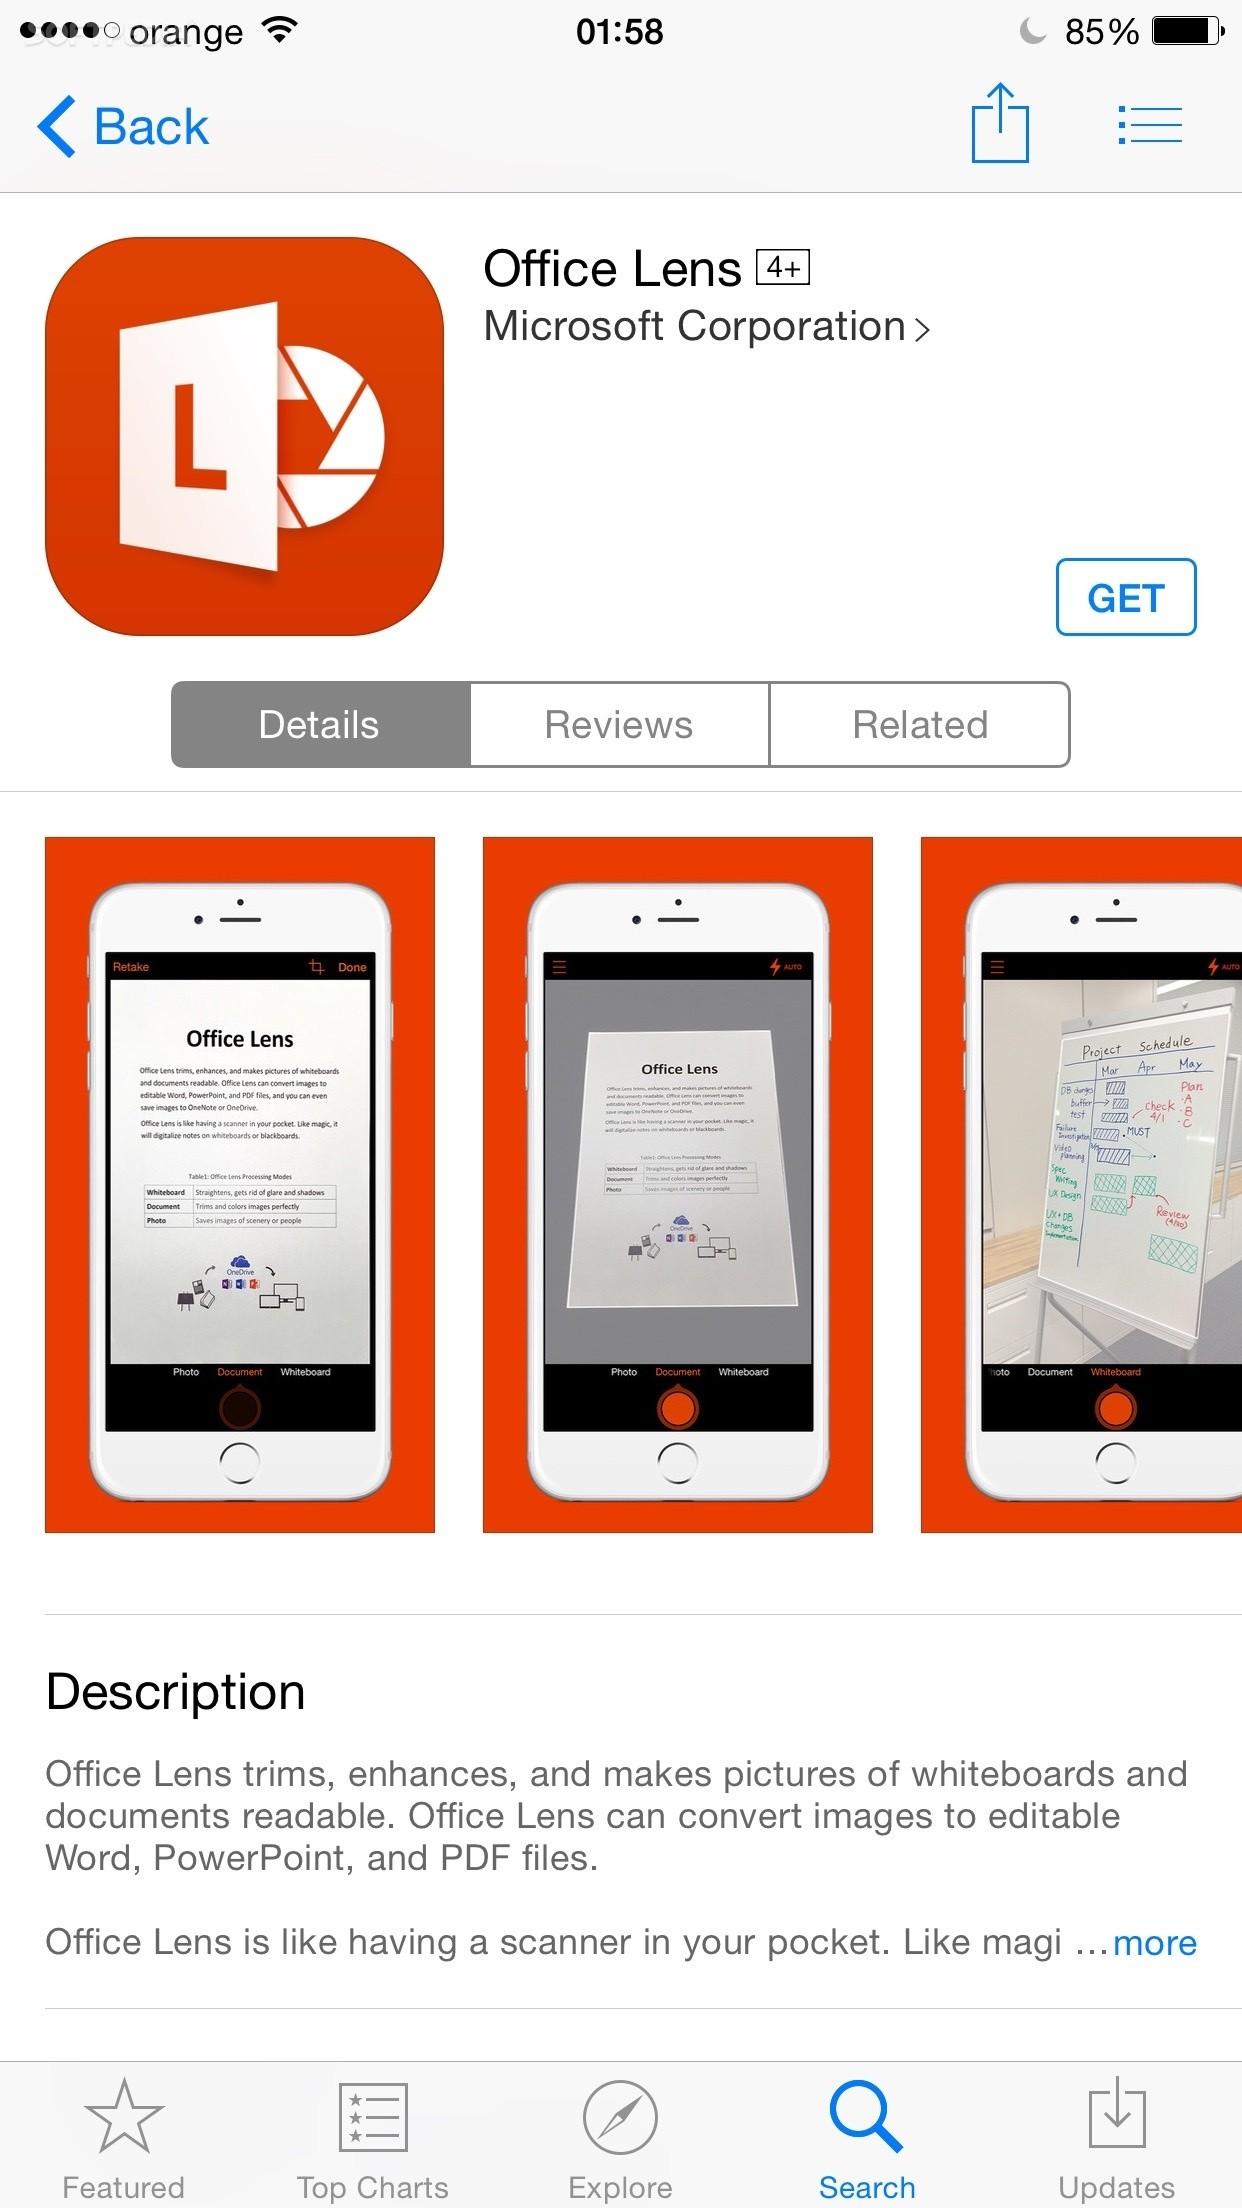 Microsoft Releases Office Lens Pocket Scanner App for iPhone